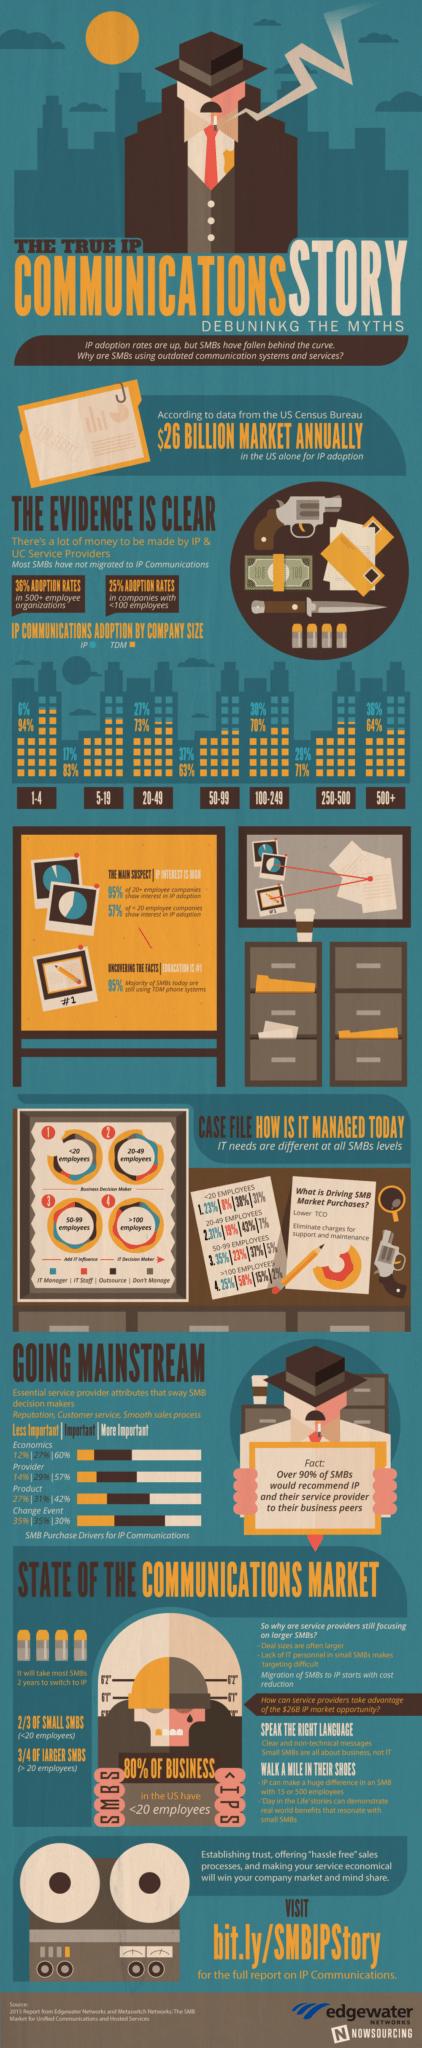 MarketSurvey_Infographic